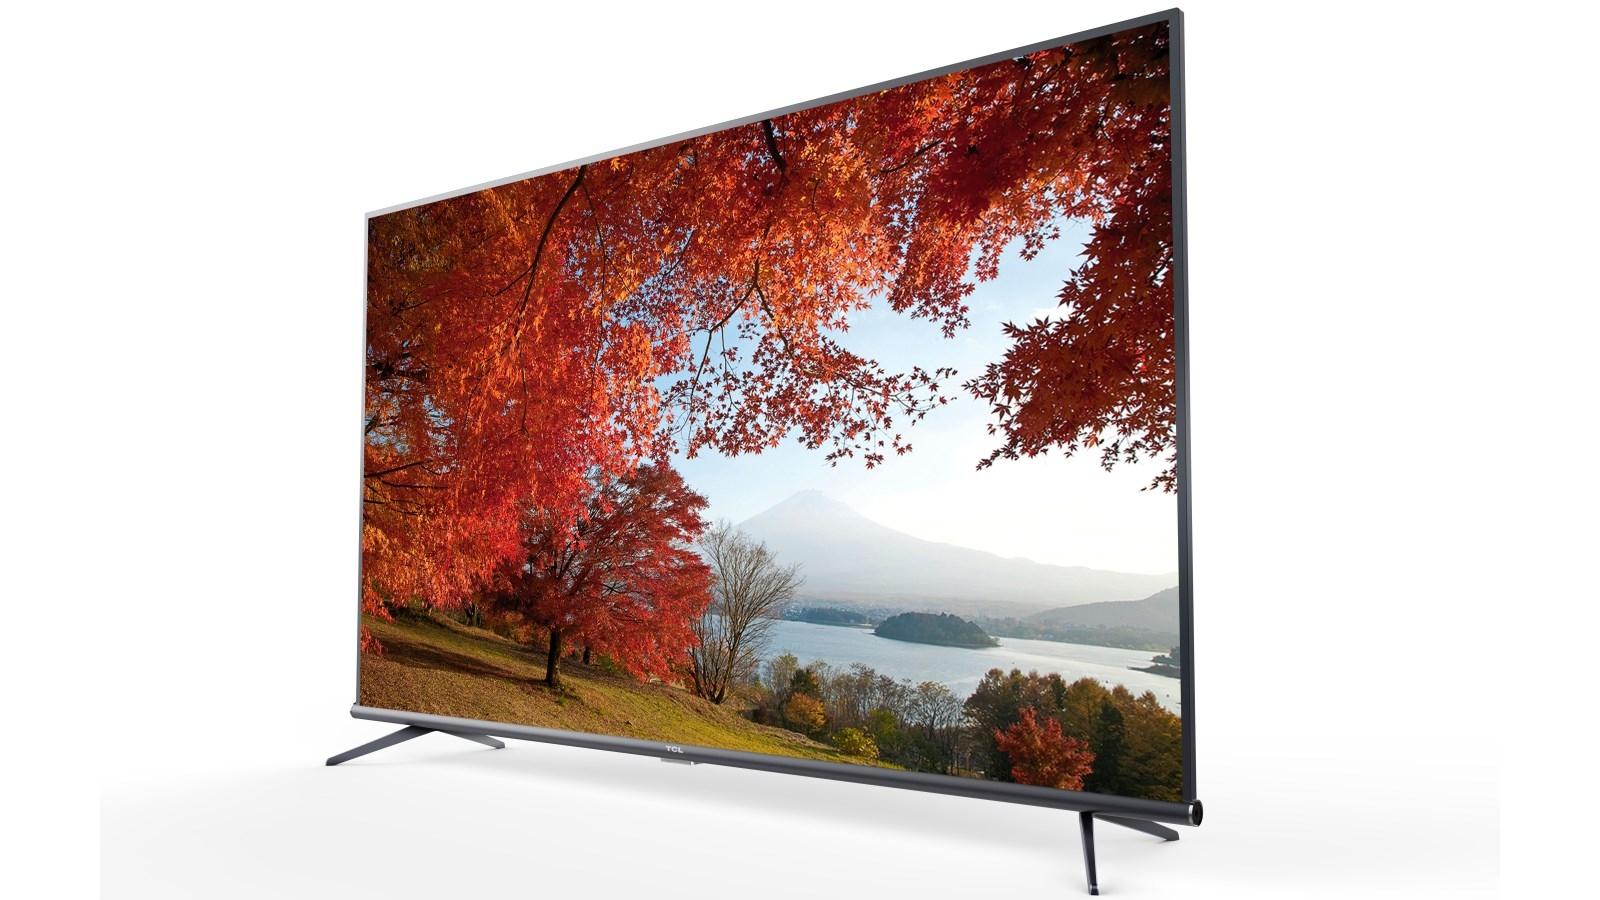 TCL 43-inch P8M QUHD LED LCD Smart TV